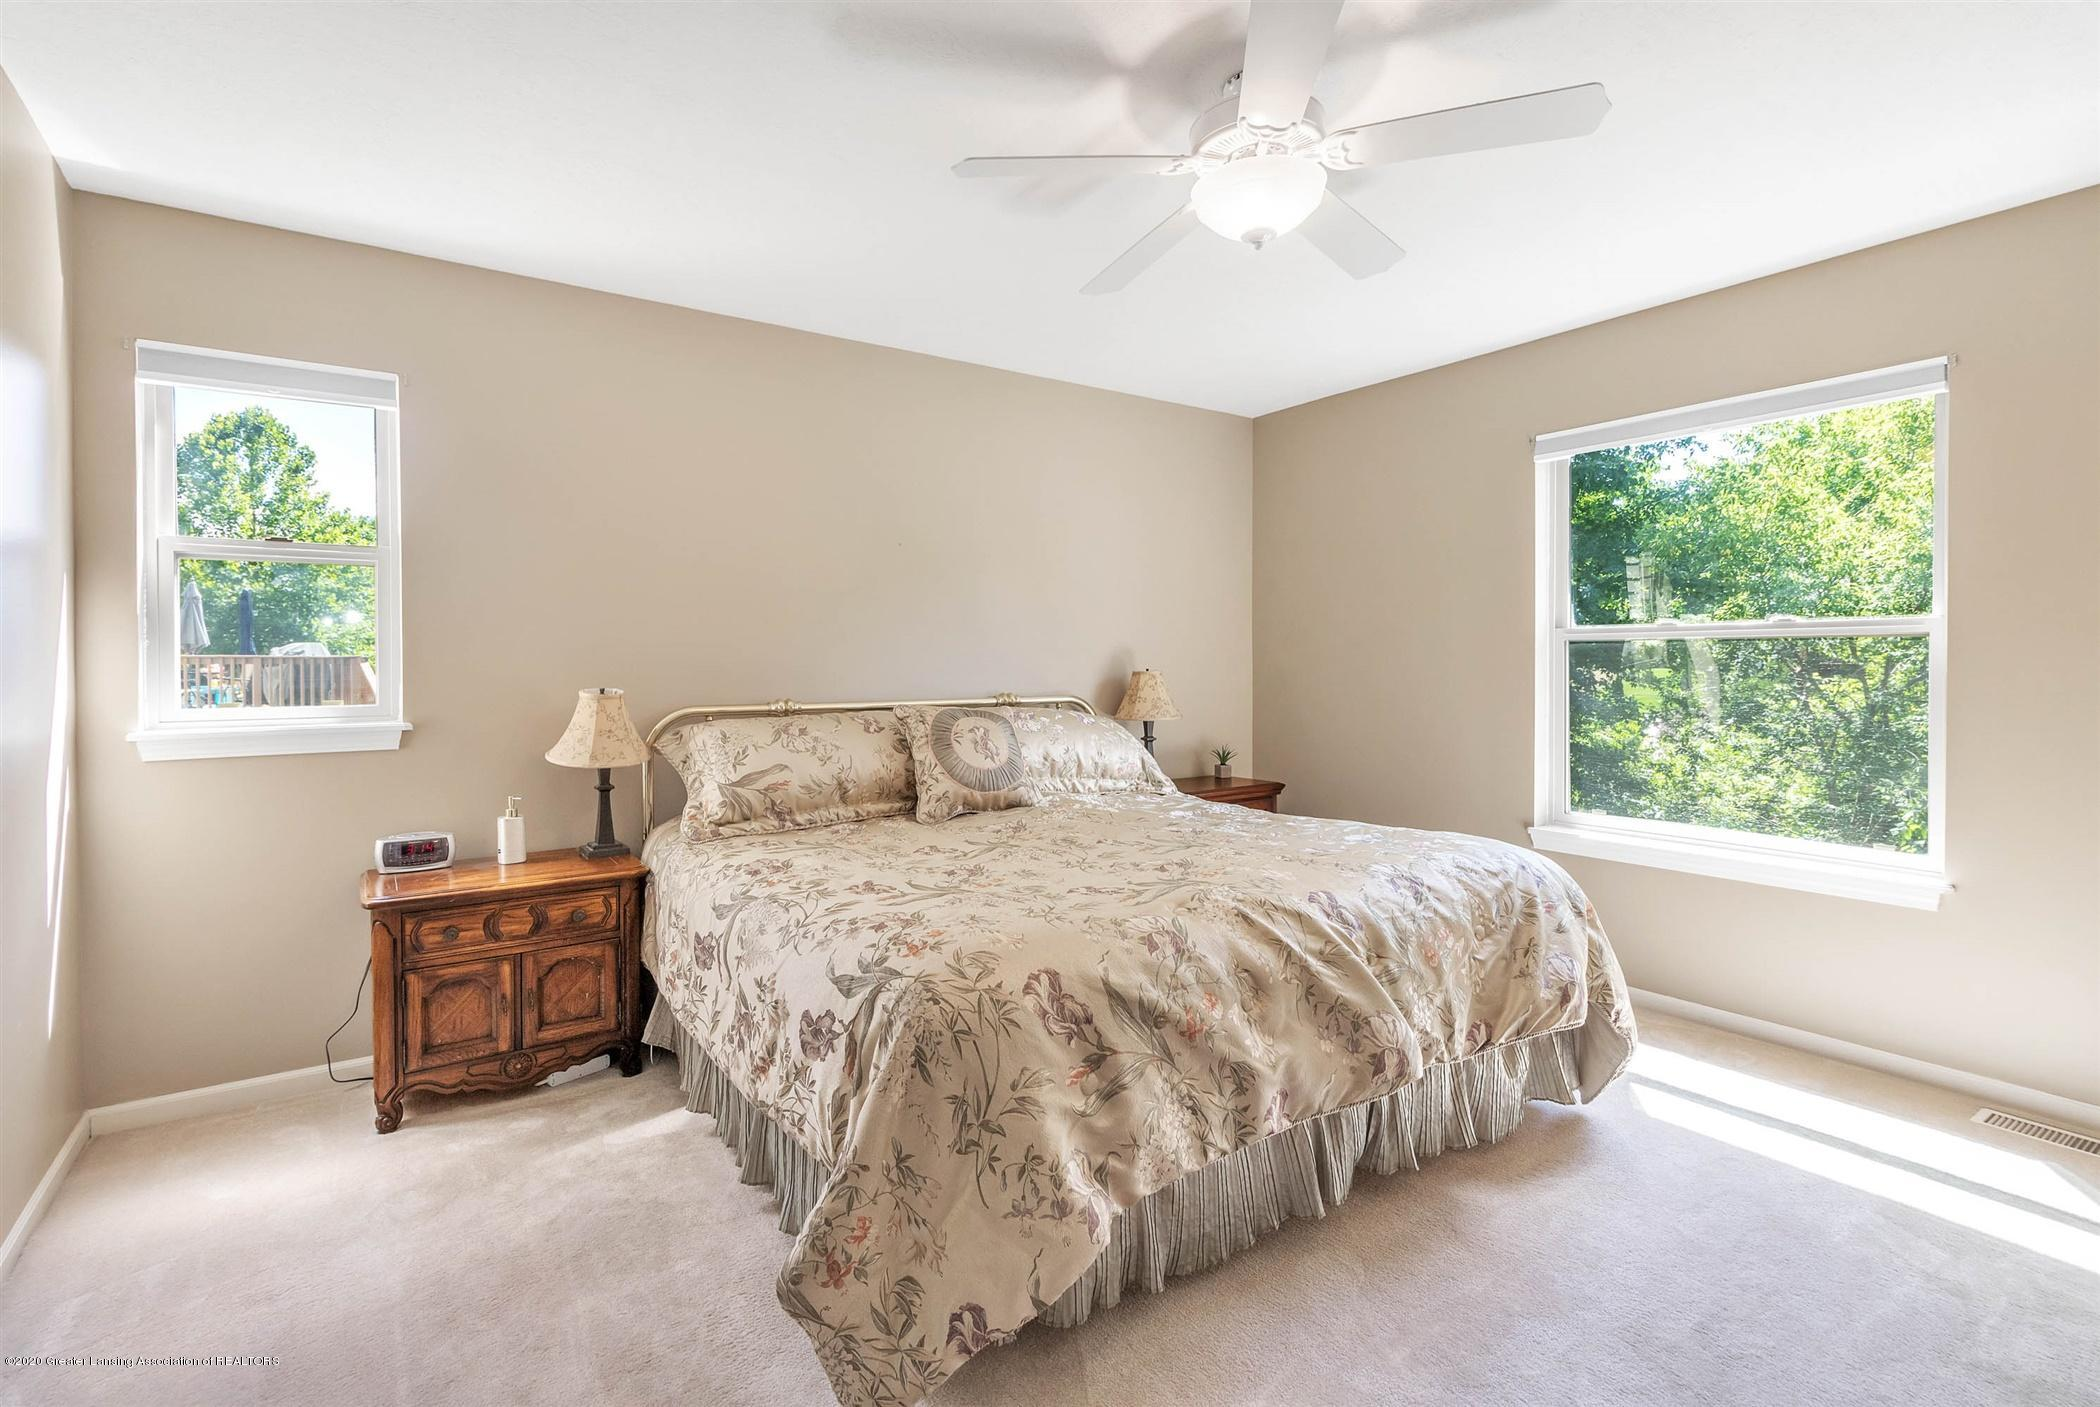 2383 Klompen St - Master Bedroom - 20